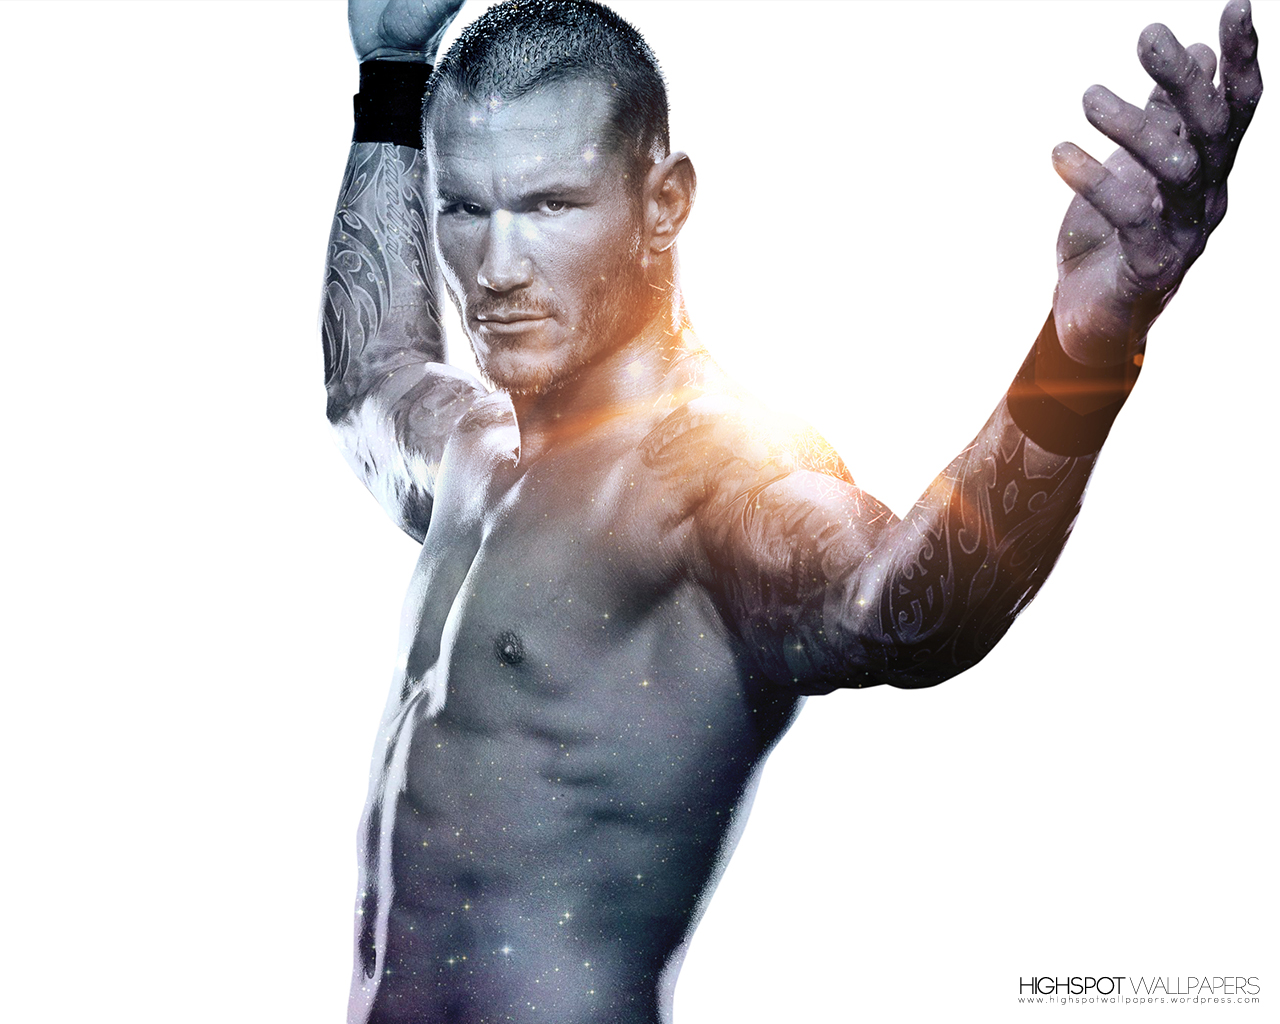 Batista Hd Wallpapers 2014 Randy Orton Highspot Wrestling Wallpapers